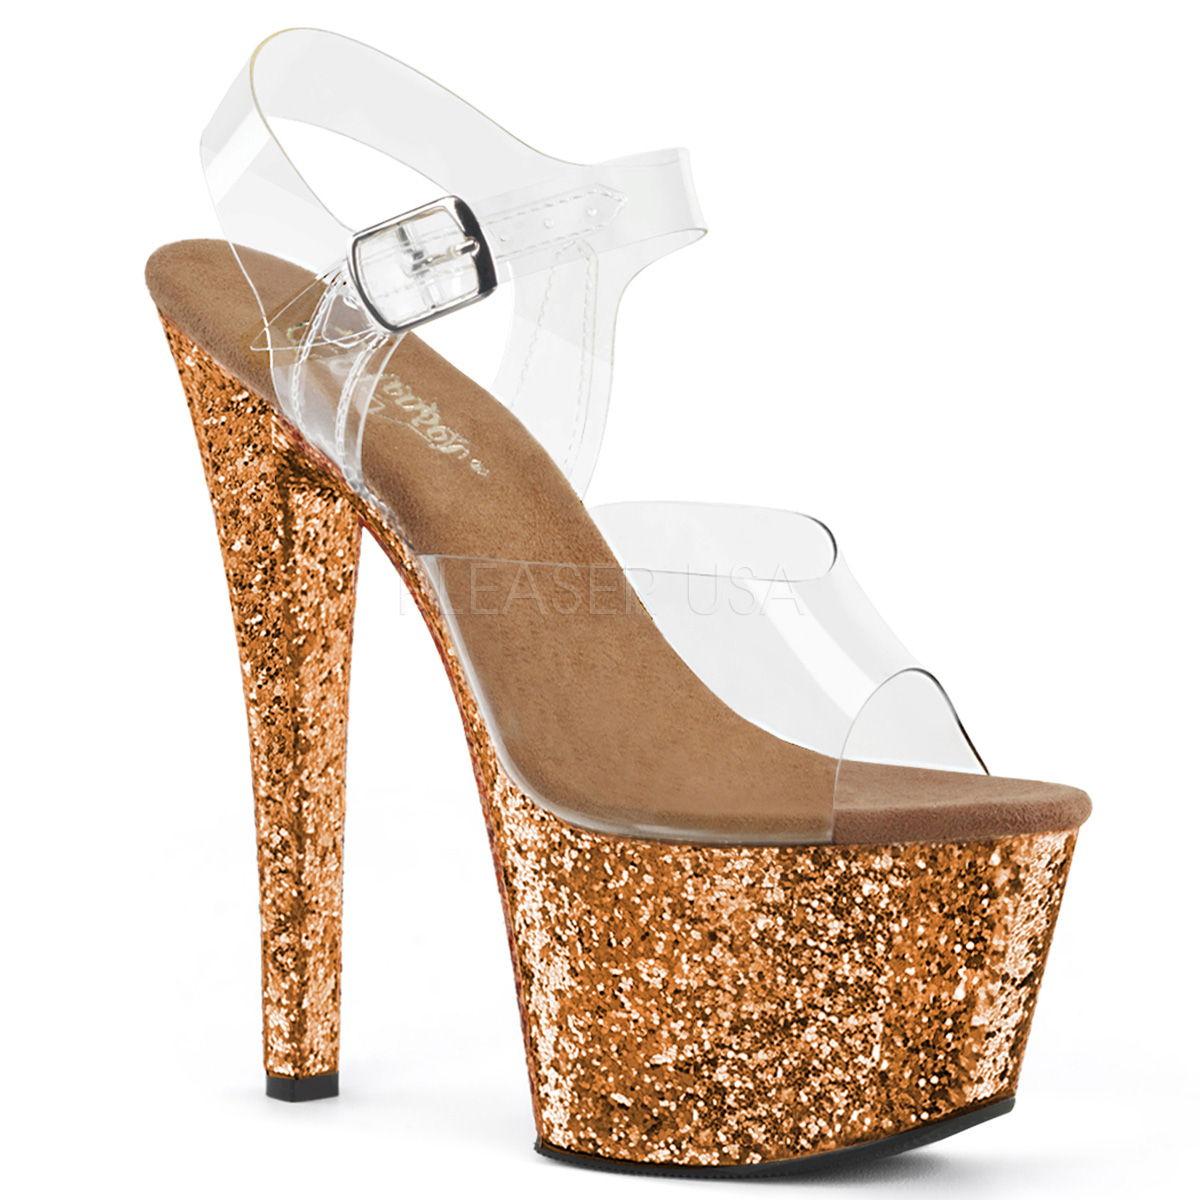 e731abdf49eb Bronze-glitter-18-cm-Pleaser-SKY-308LG-Pole-dancing-high-heels-shoes -11477 0.jpg